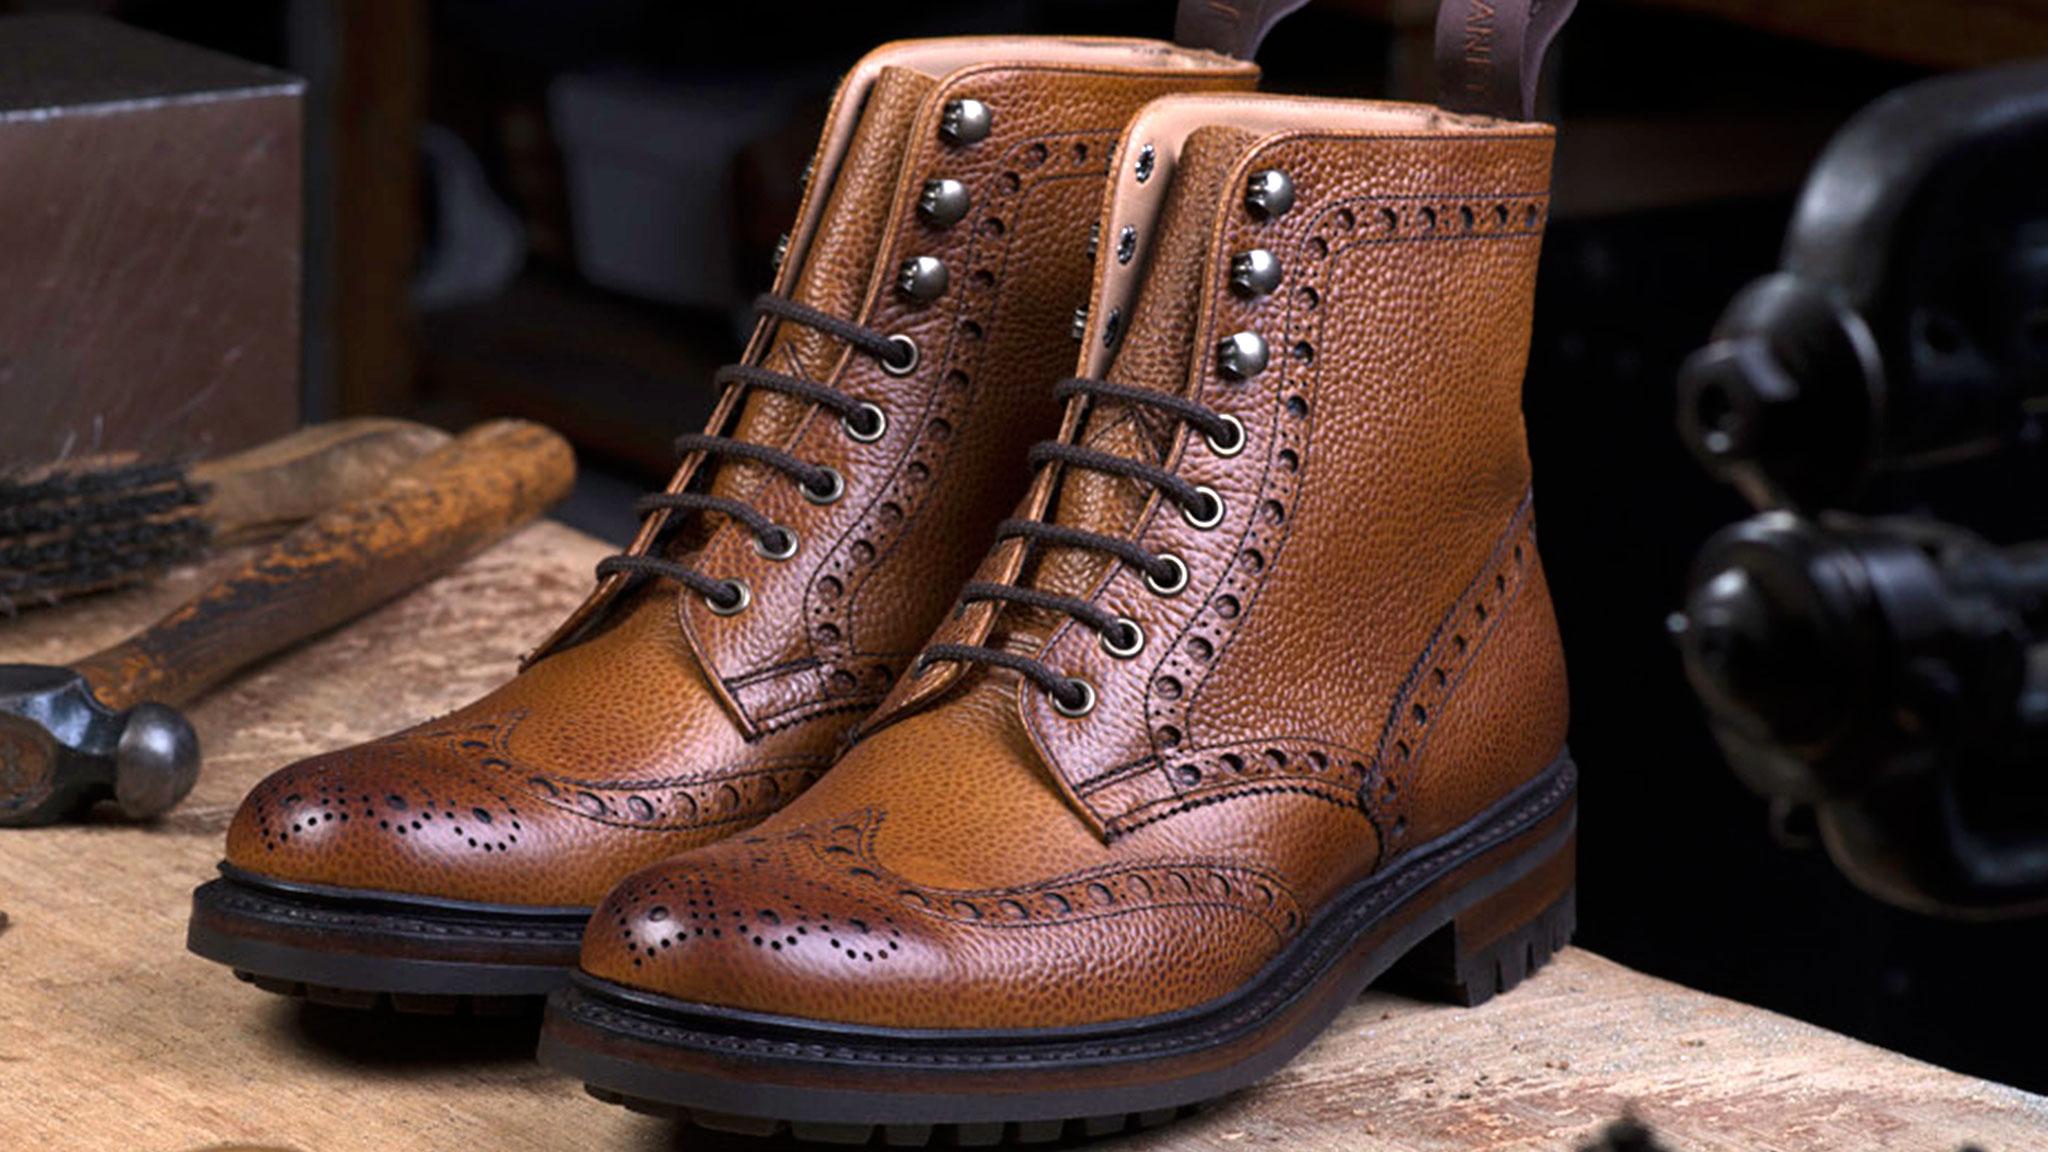 Chaussures - Bottines Joseph Cheaney & Fils rnqDyj